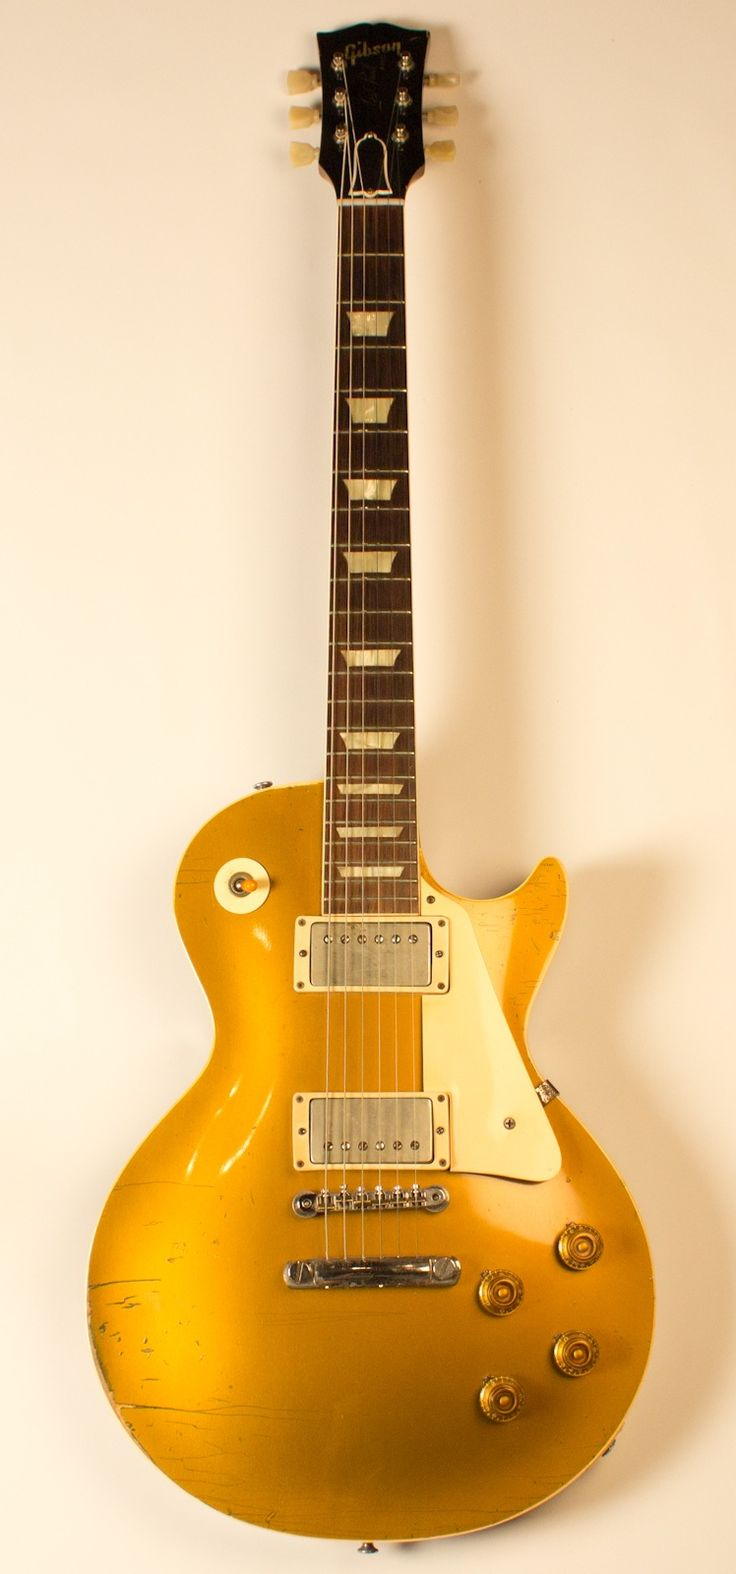 1957 Les Paul Standard Gold Top